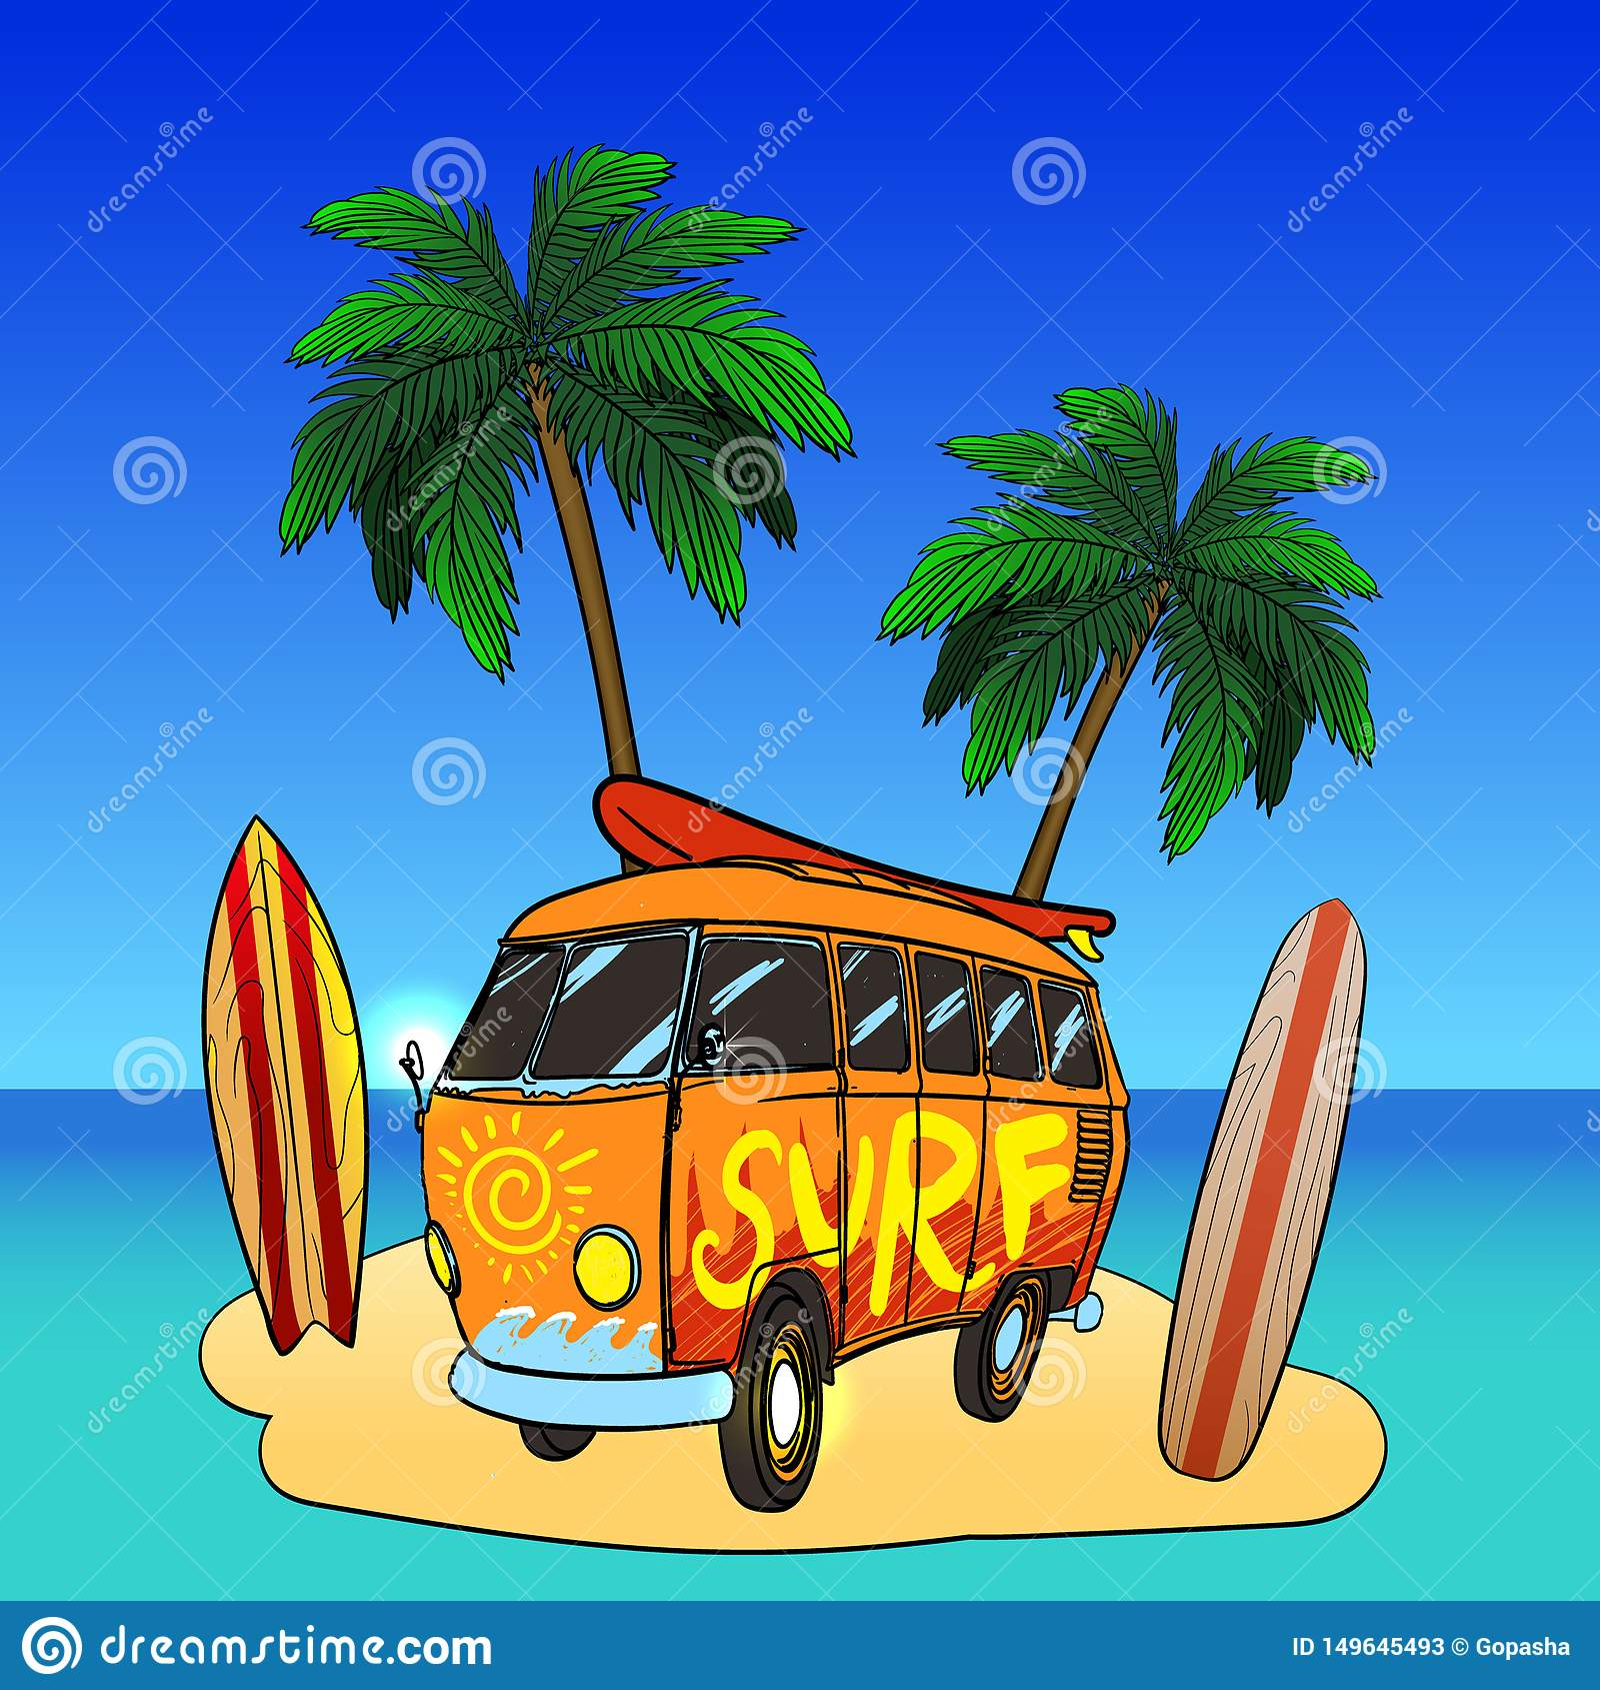 Old fashion bus with palm trees. Retro surf bus, surf symbols